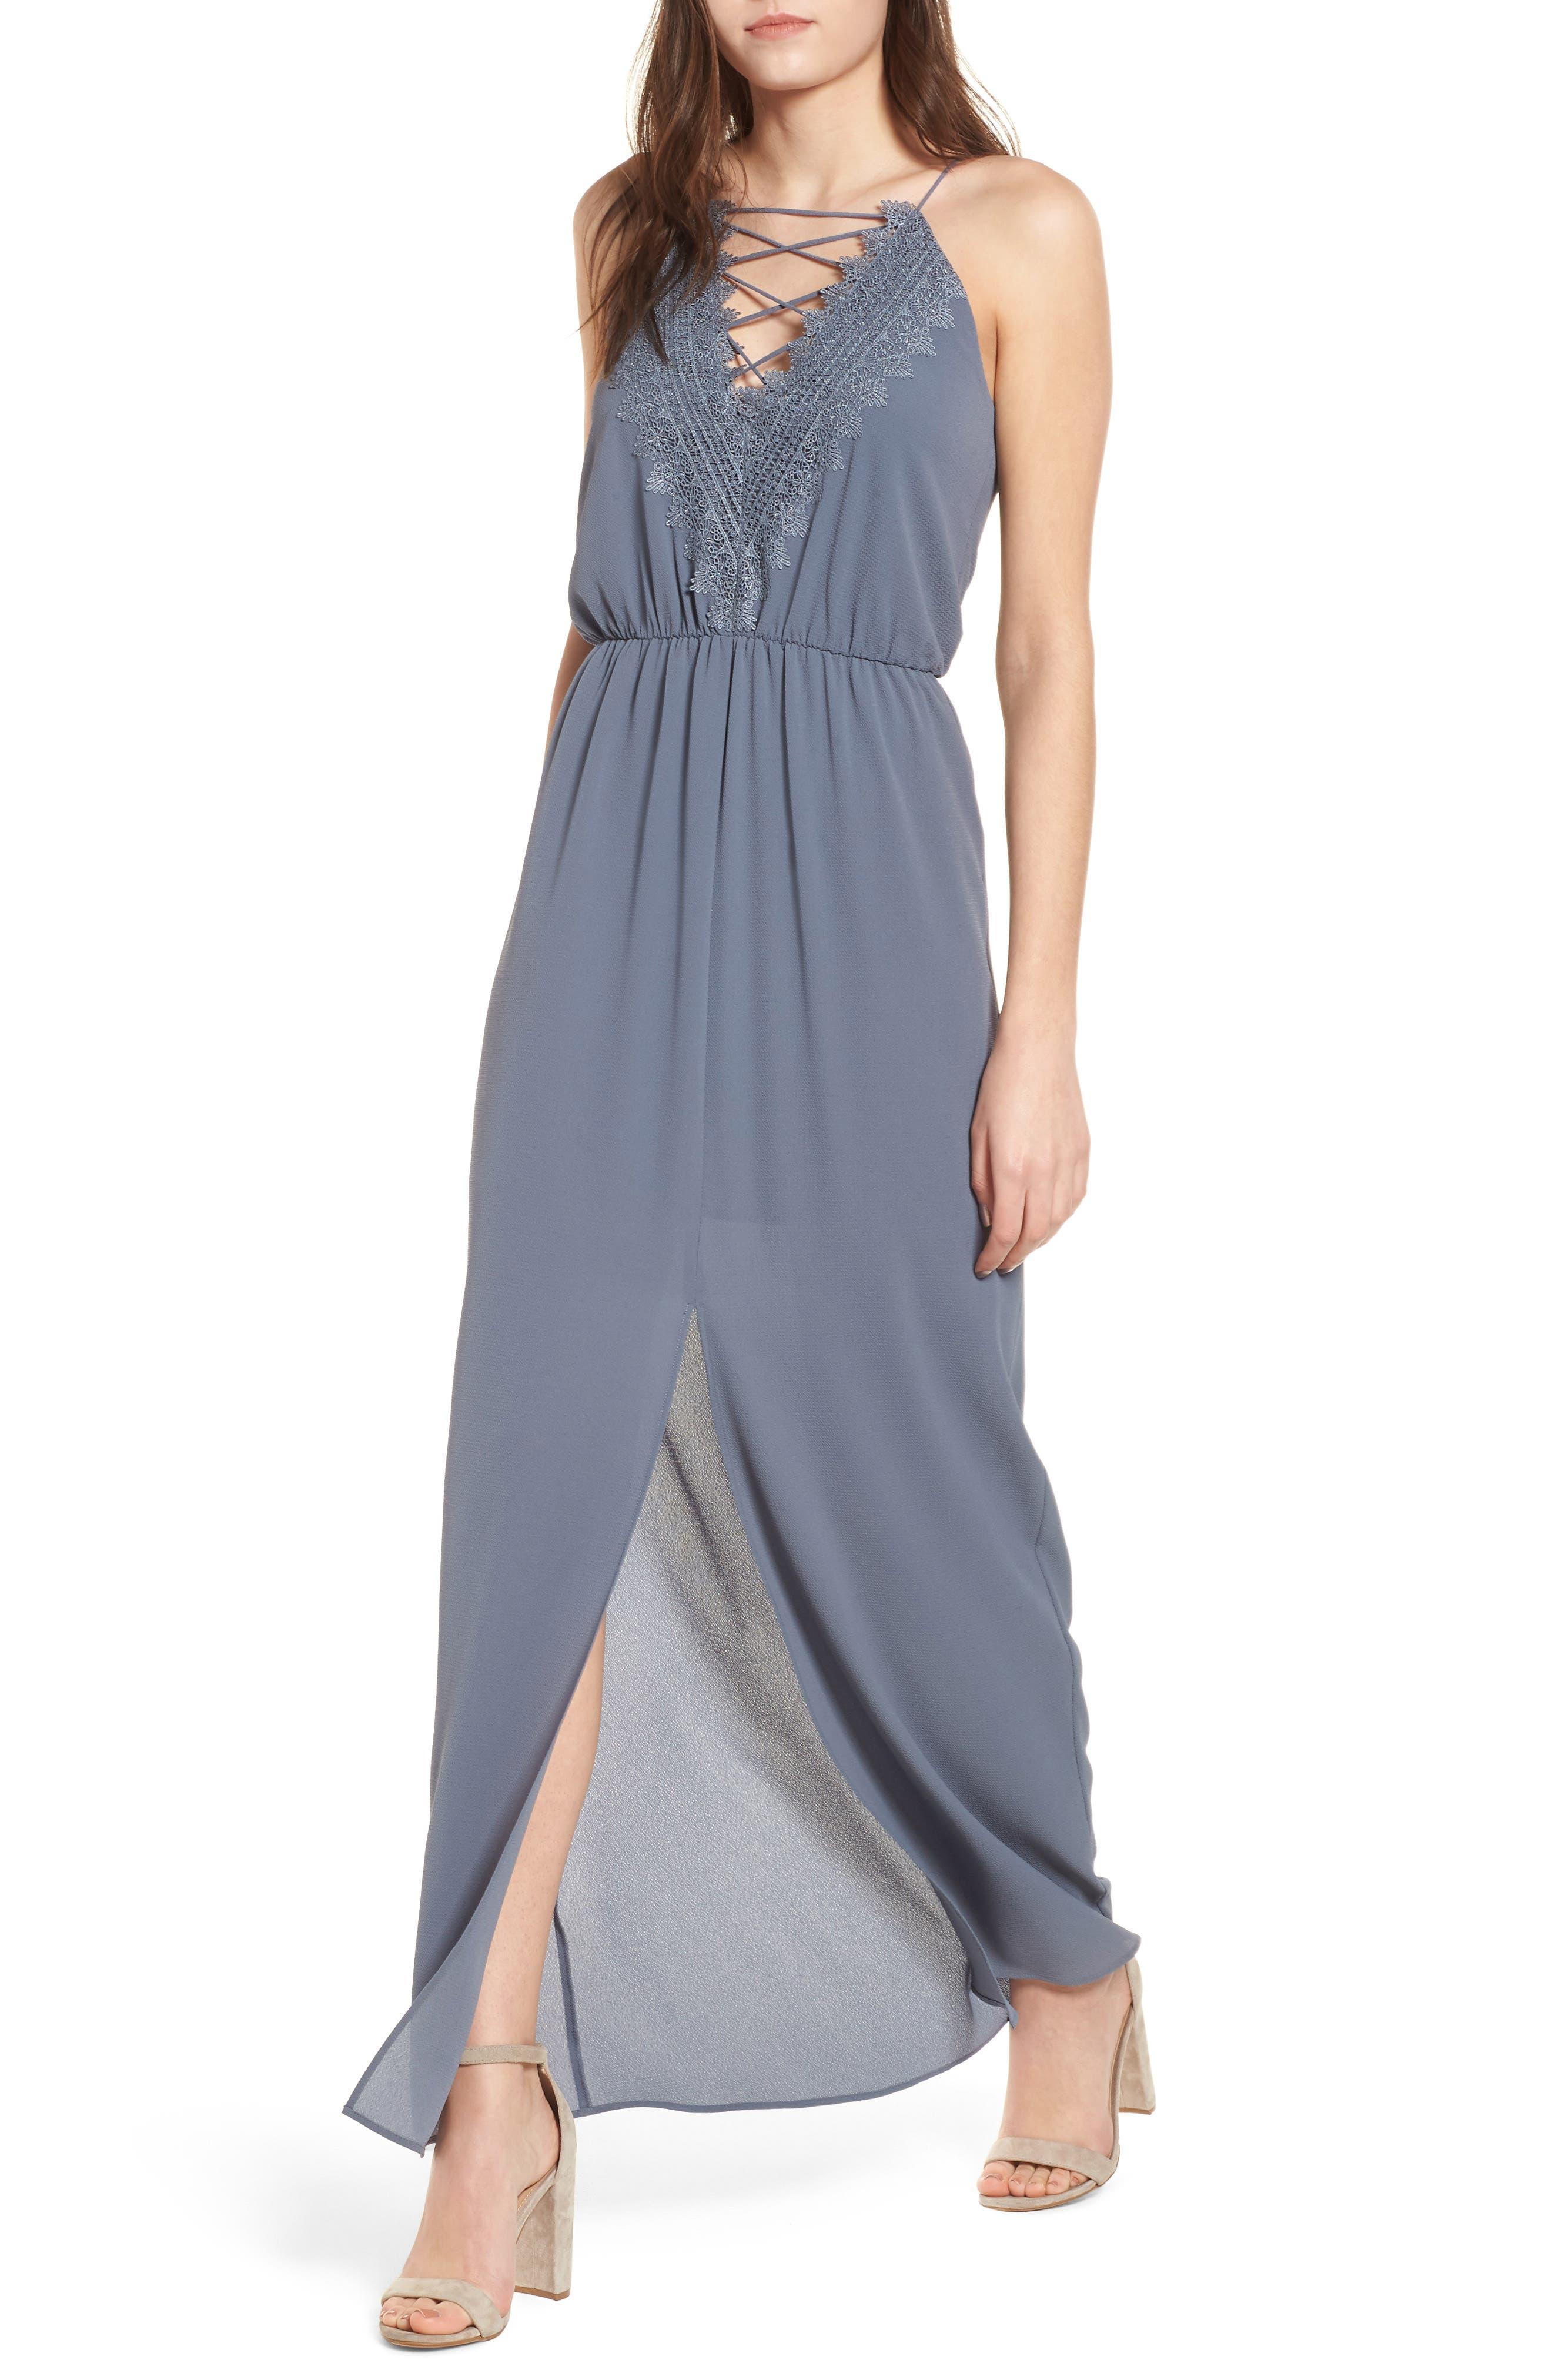 WAYF, Posie Maxi Dress, Main thumbnail 1, color, 027